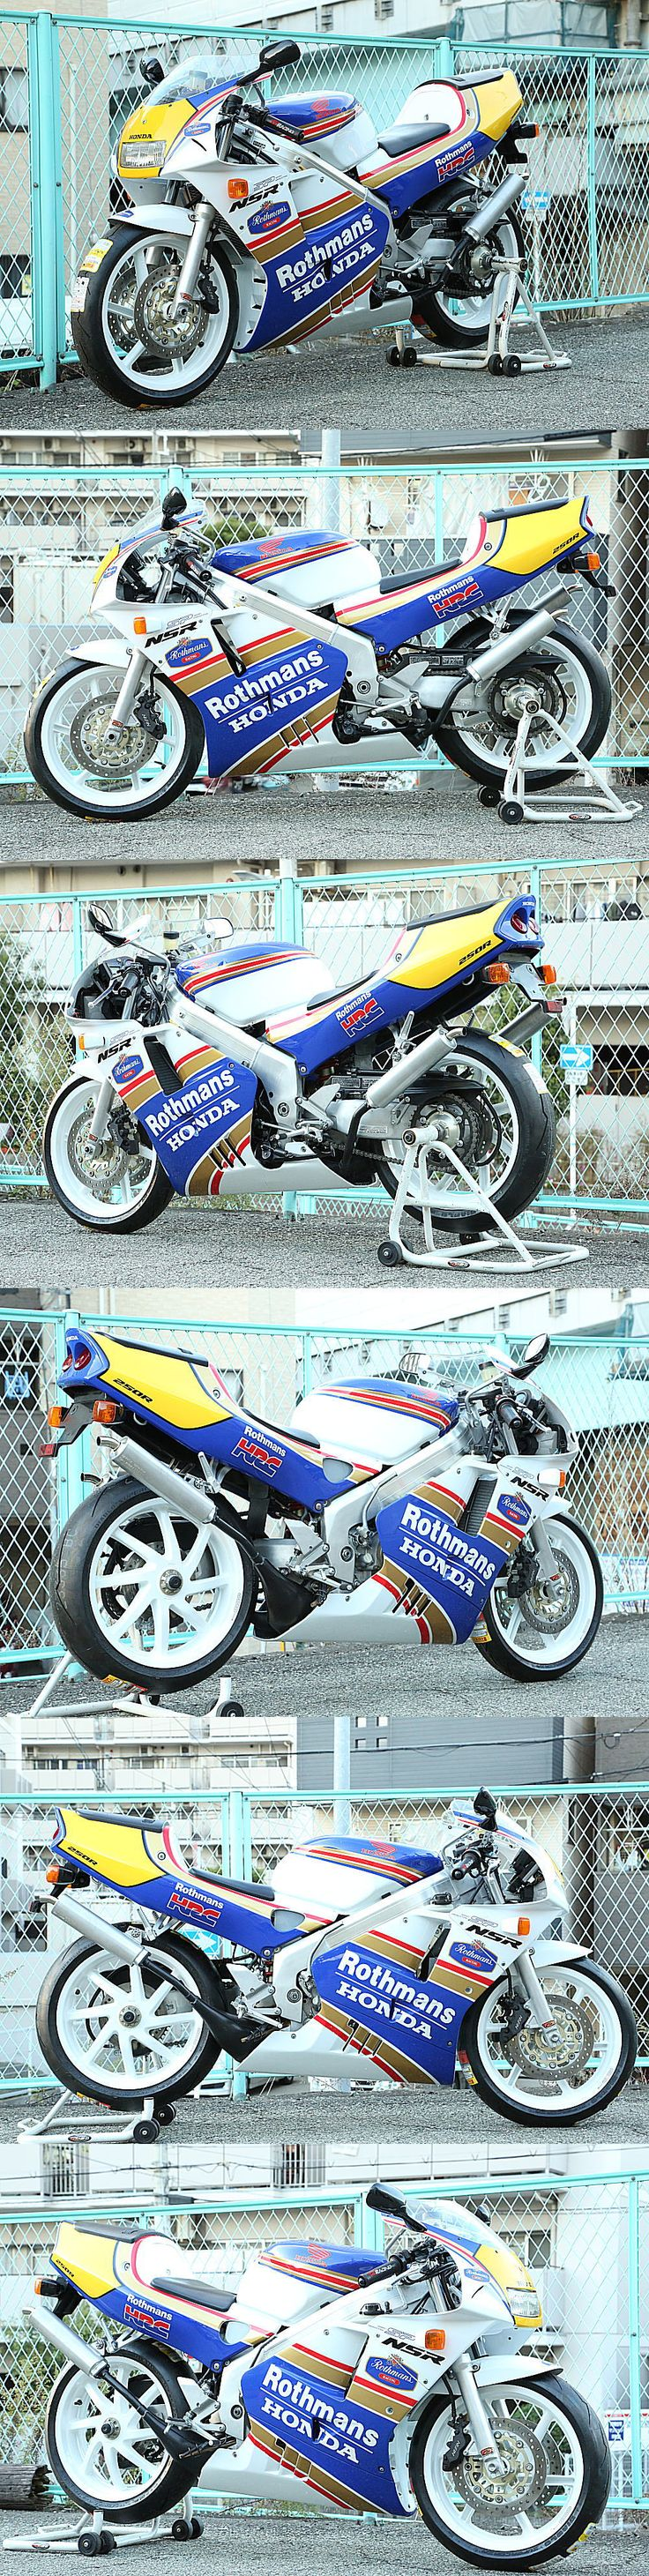 ☆NSR250R-SP本物ロスマンズ!フルOH済み!T2Racing製作!MC28 - T2Racing!スペシャルパーツ - ヤフオク!